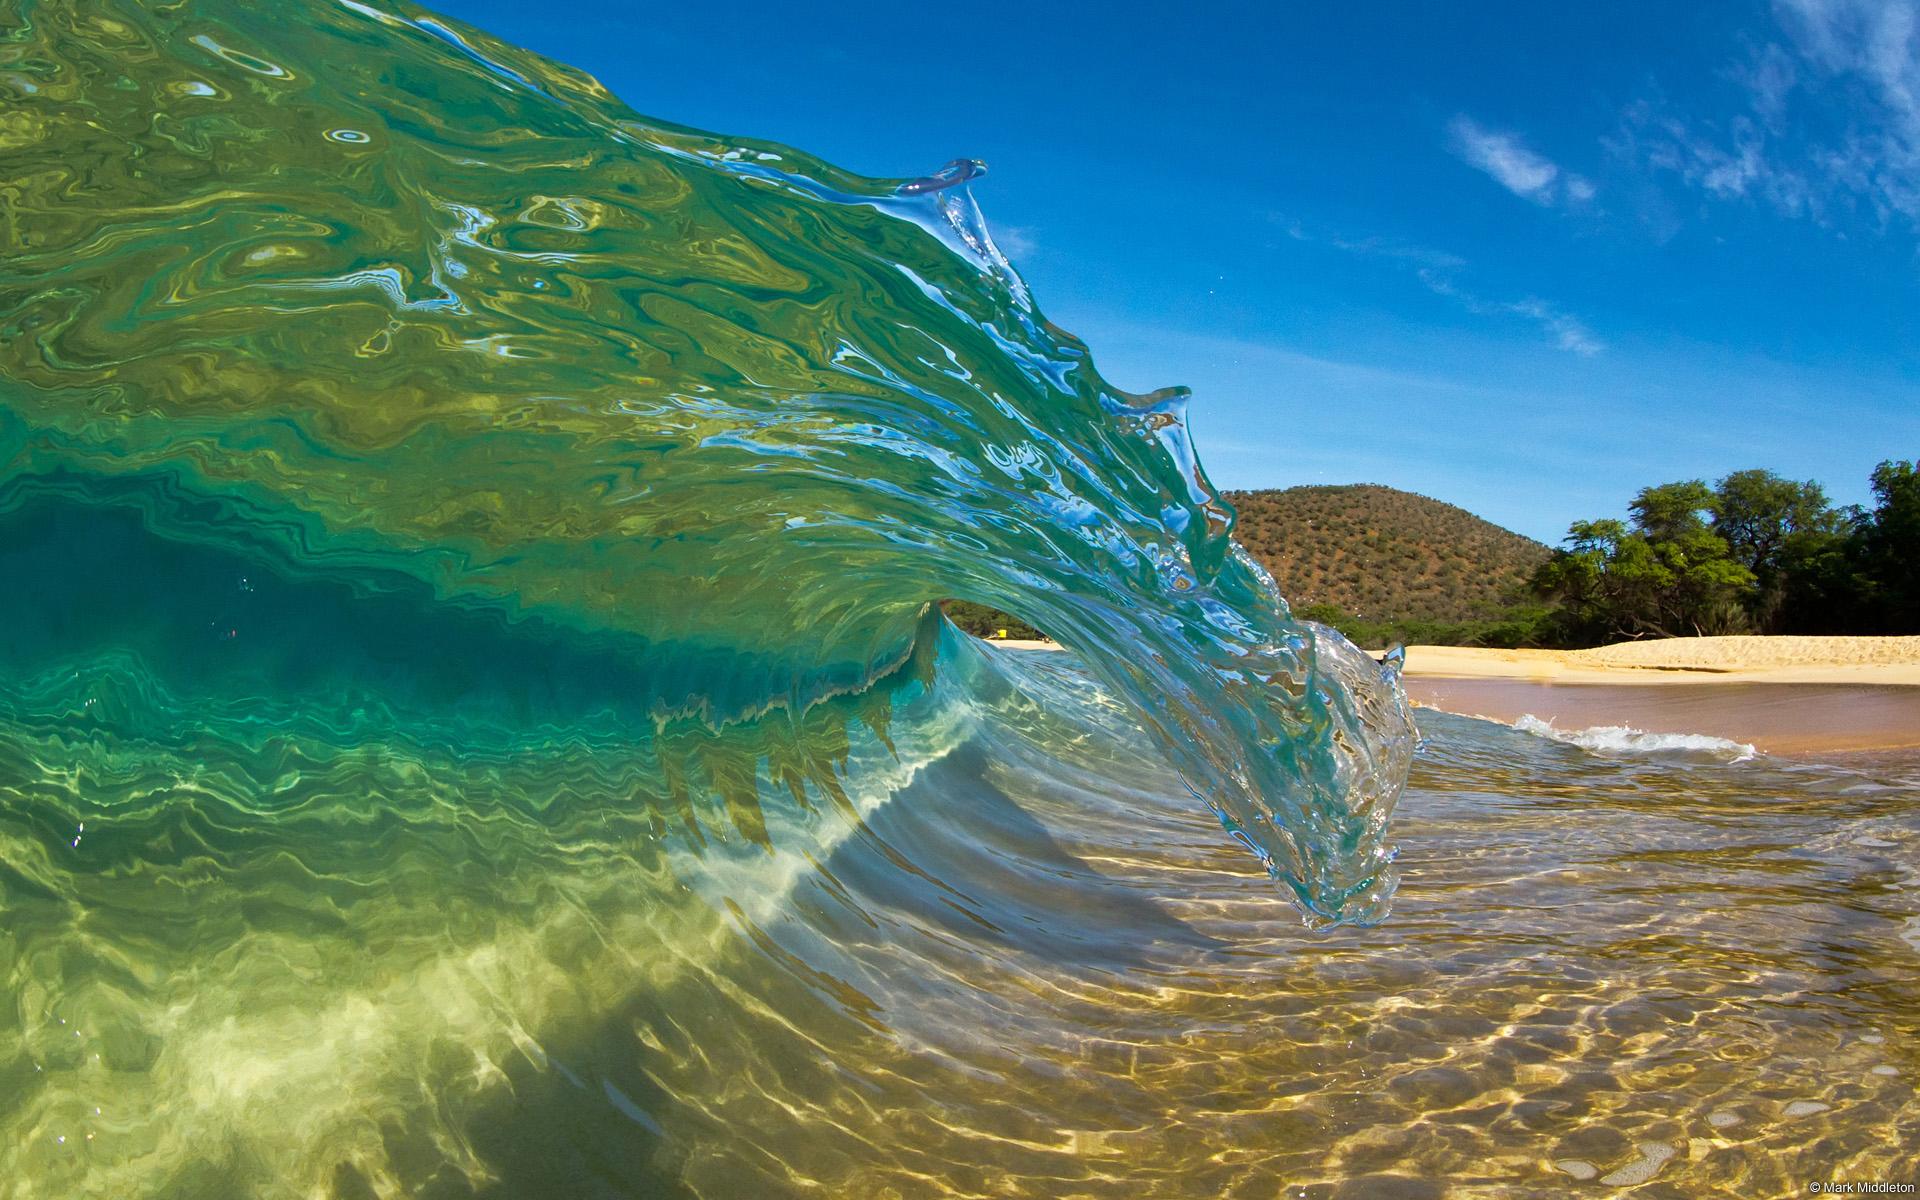 Shorebreak Curl Big Makena Beach Maui Hawaii US Maui Hawaii 1920x1200